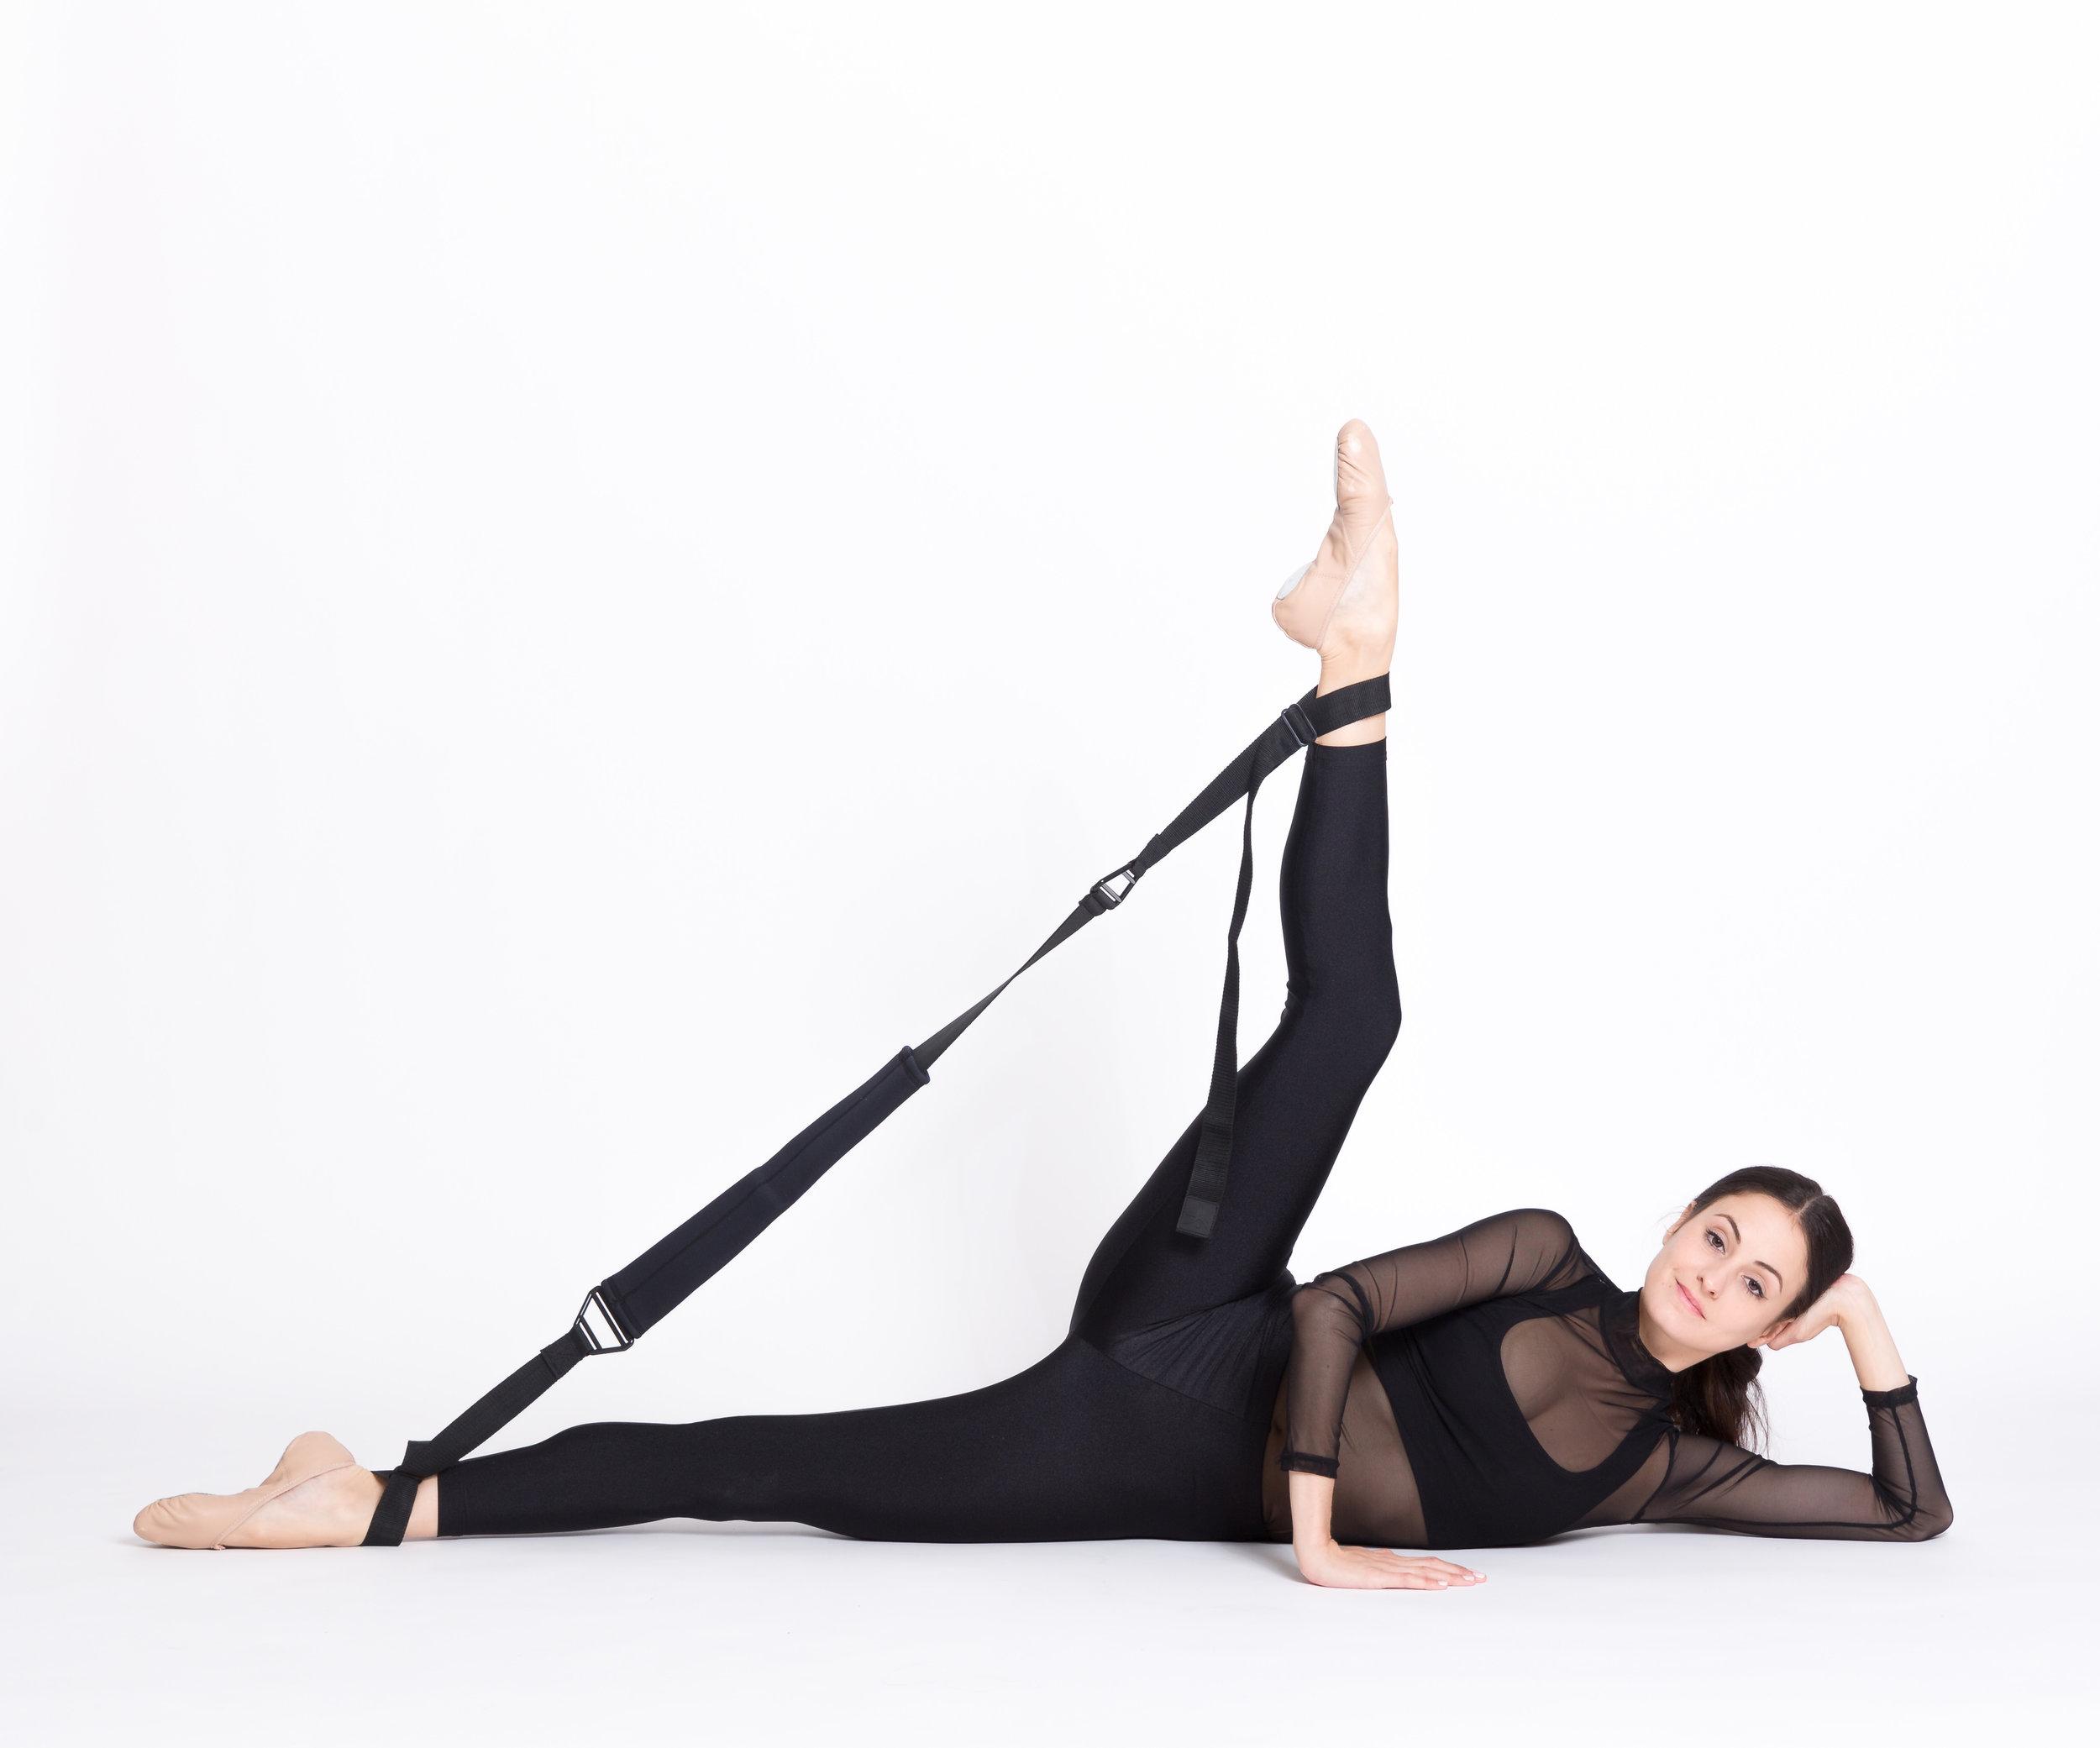 Melanie Hamrick of ABT doing Flexistretcher side kicks